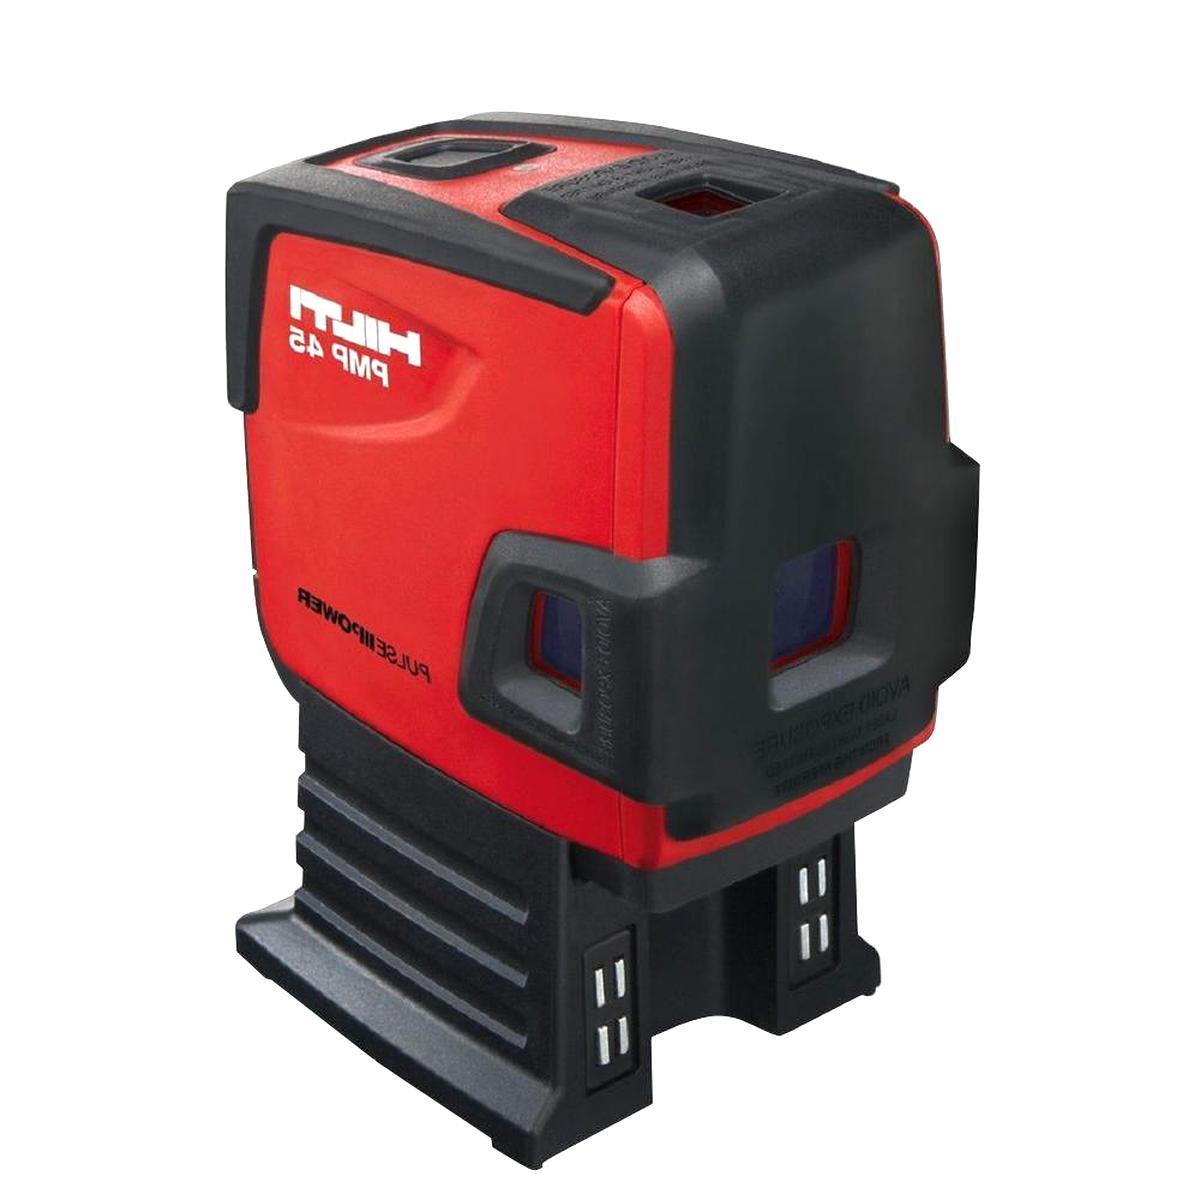 laser hilti pmp d'occasion